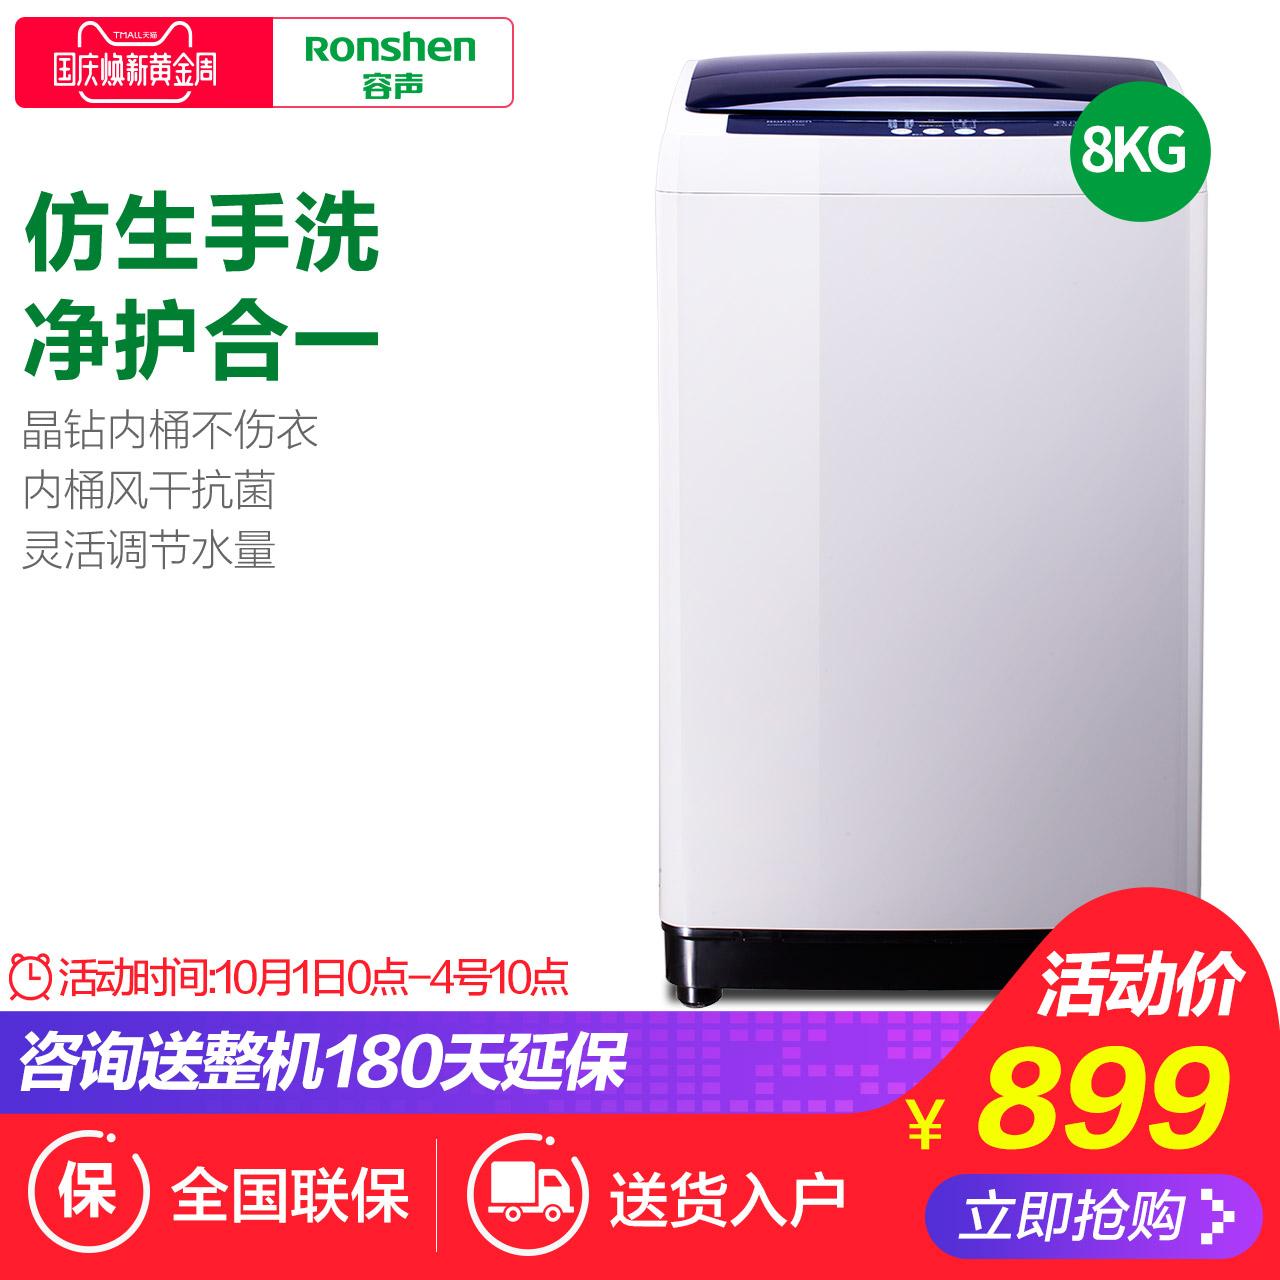 Ronshen-容声 XQB80-L1528 8公斤大容量全自动洗衣机家用波轮